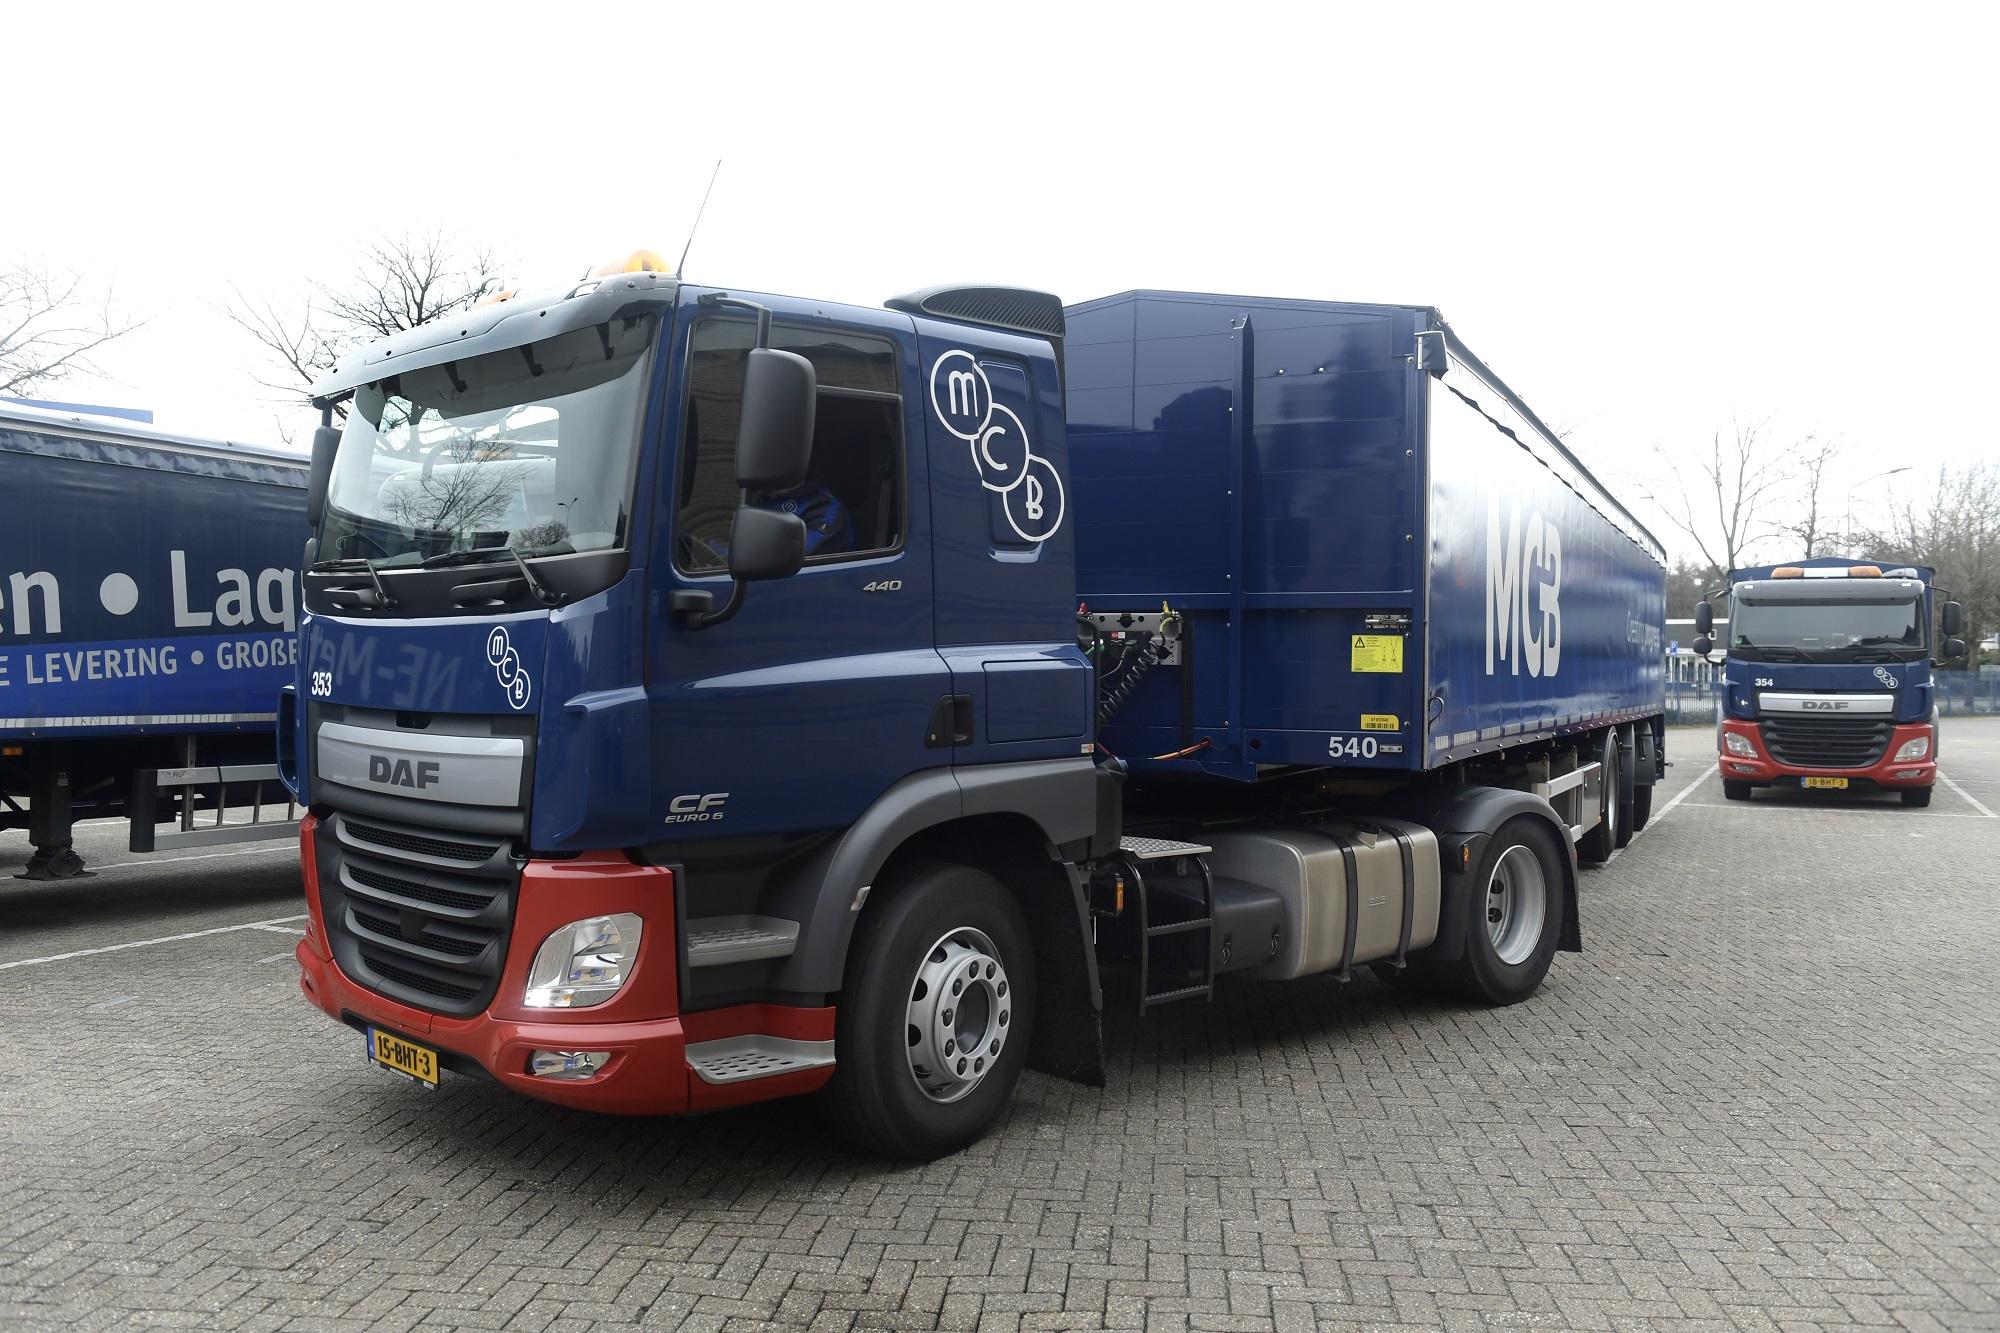 DAF-truck-met-camerasysteem